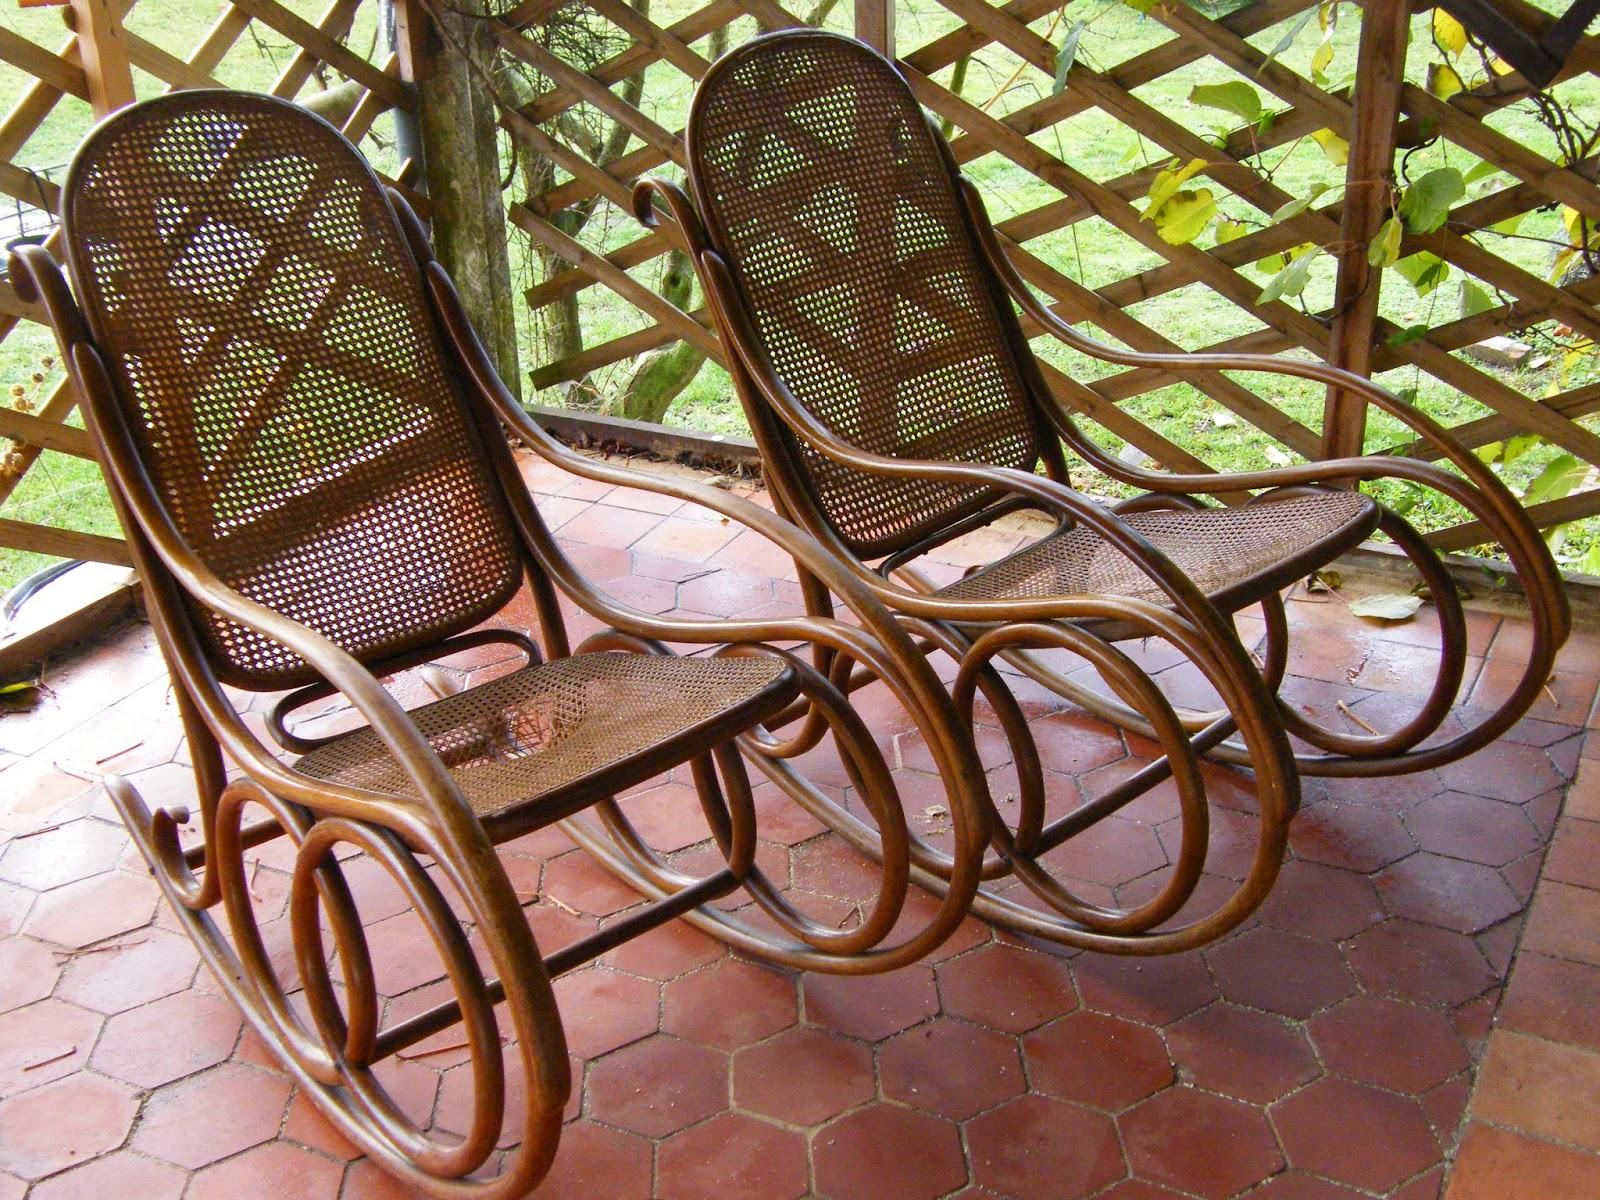 normandie cannage les si ges en bois courb style thonet. Black Bedroom Furniture Sets. Home Design Ideas